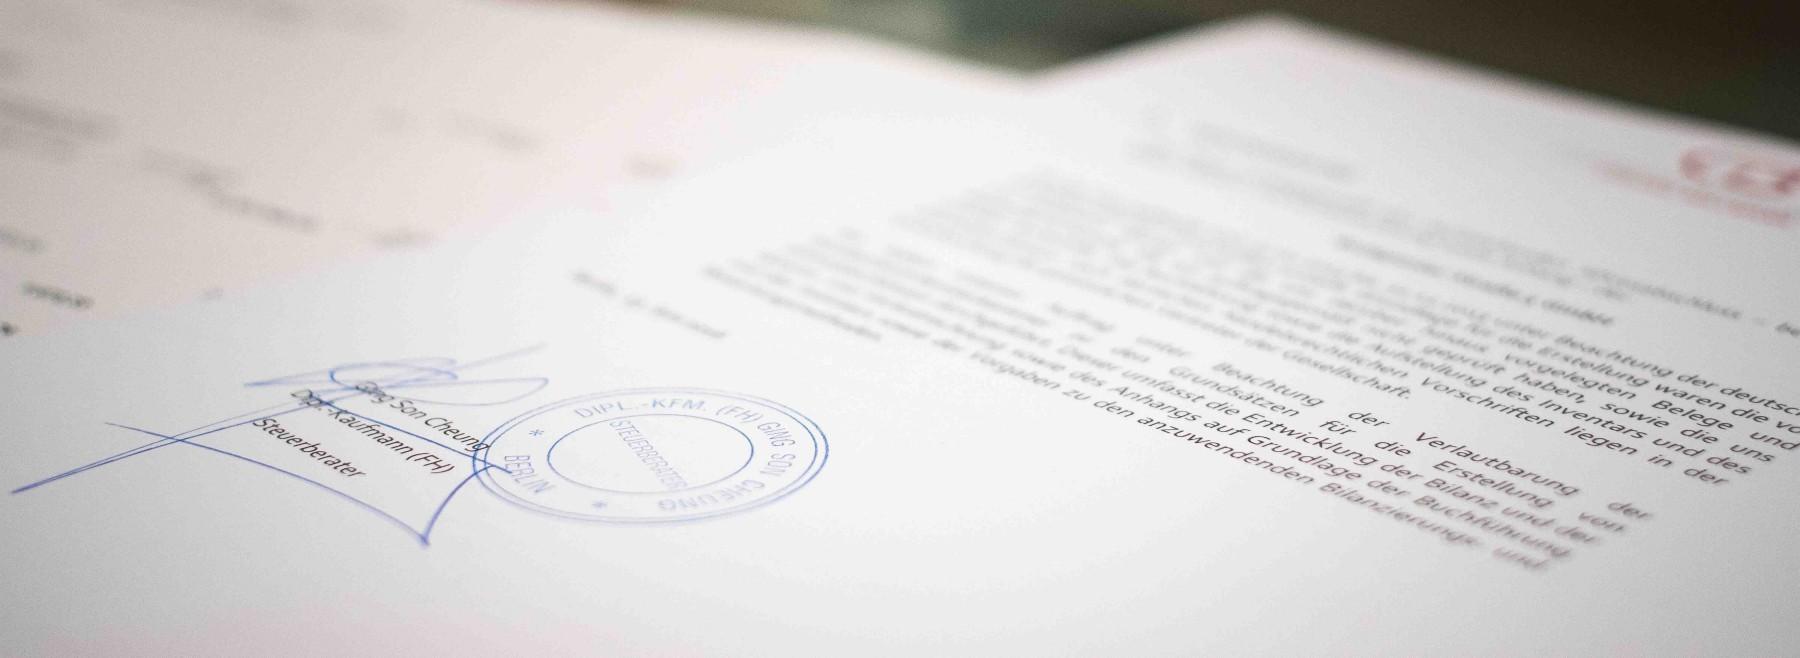 Steuerberater,Rechtsanwalt,Leistungen,Übersicht,Berlin